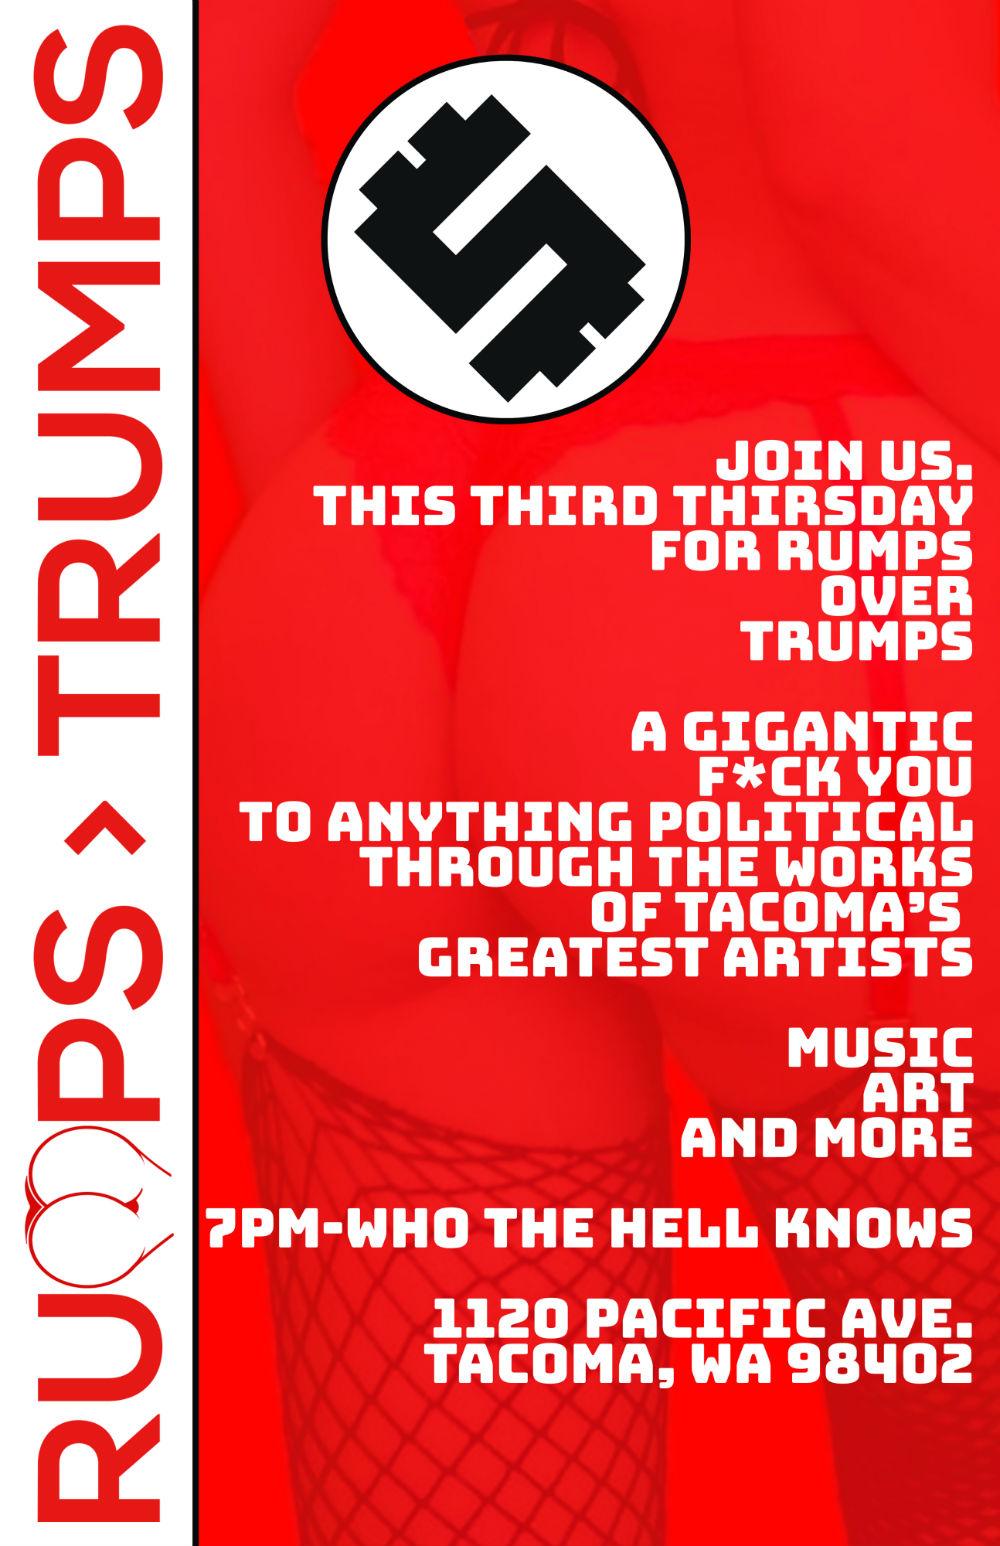 RUMPS OVER TRUMPS - 1120 Creative House Artwalk